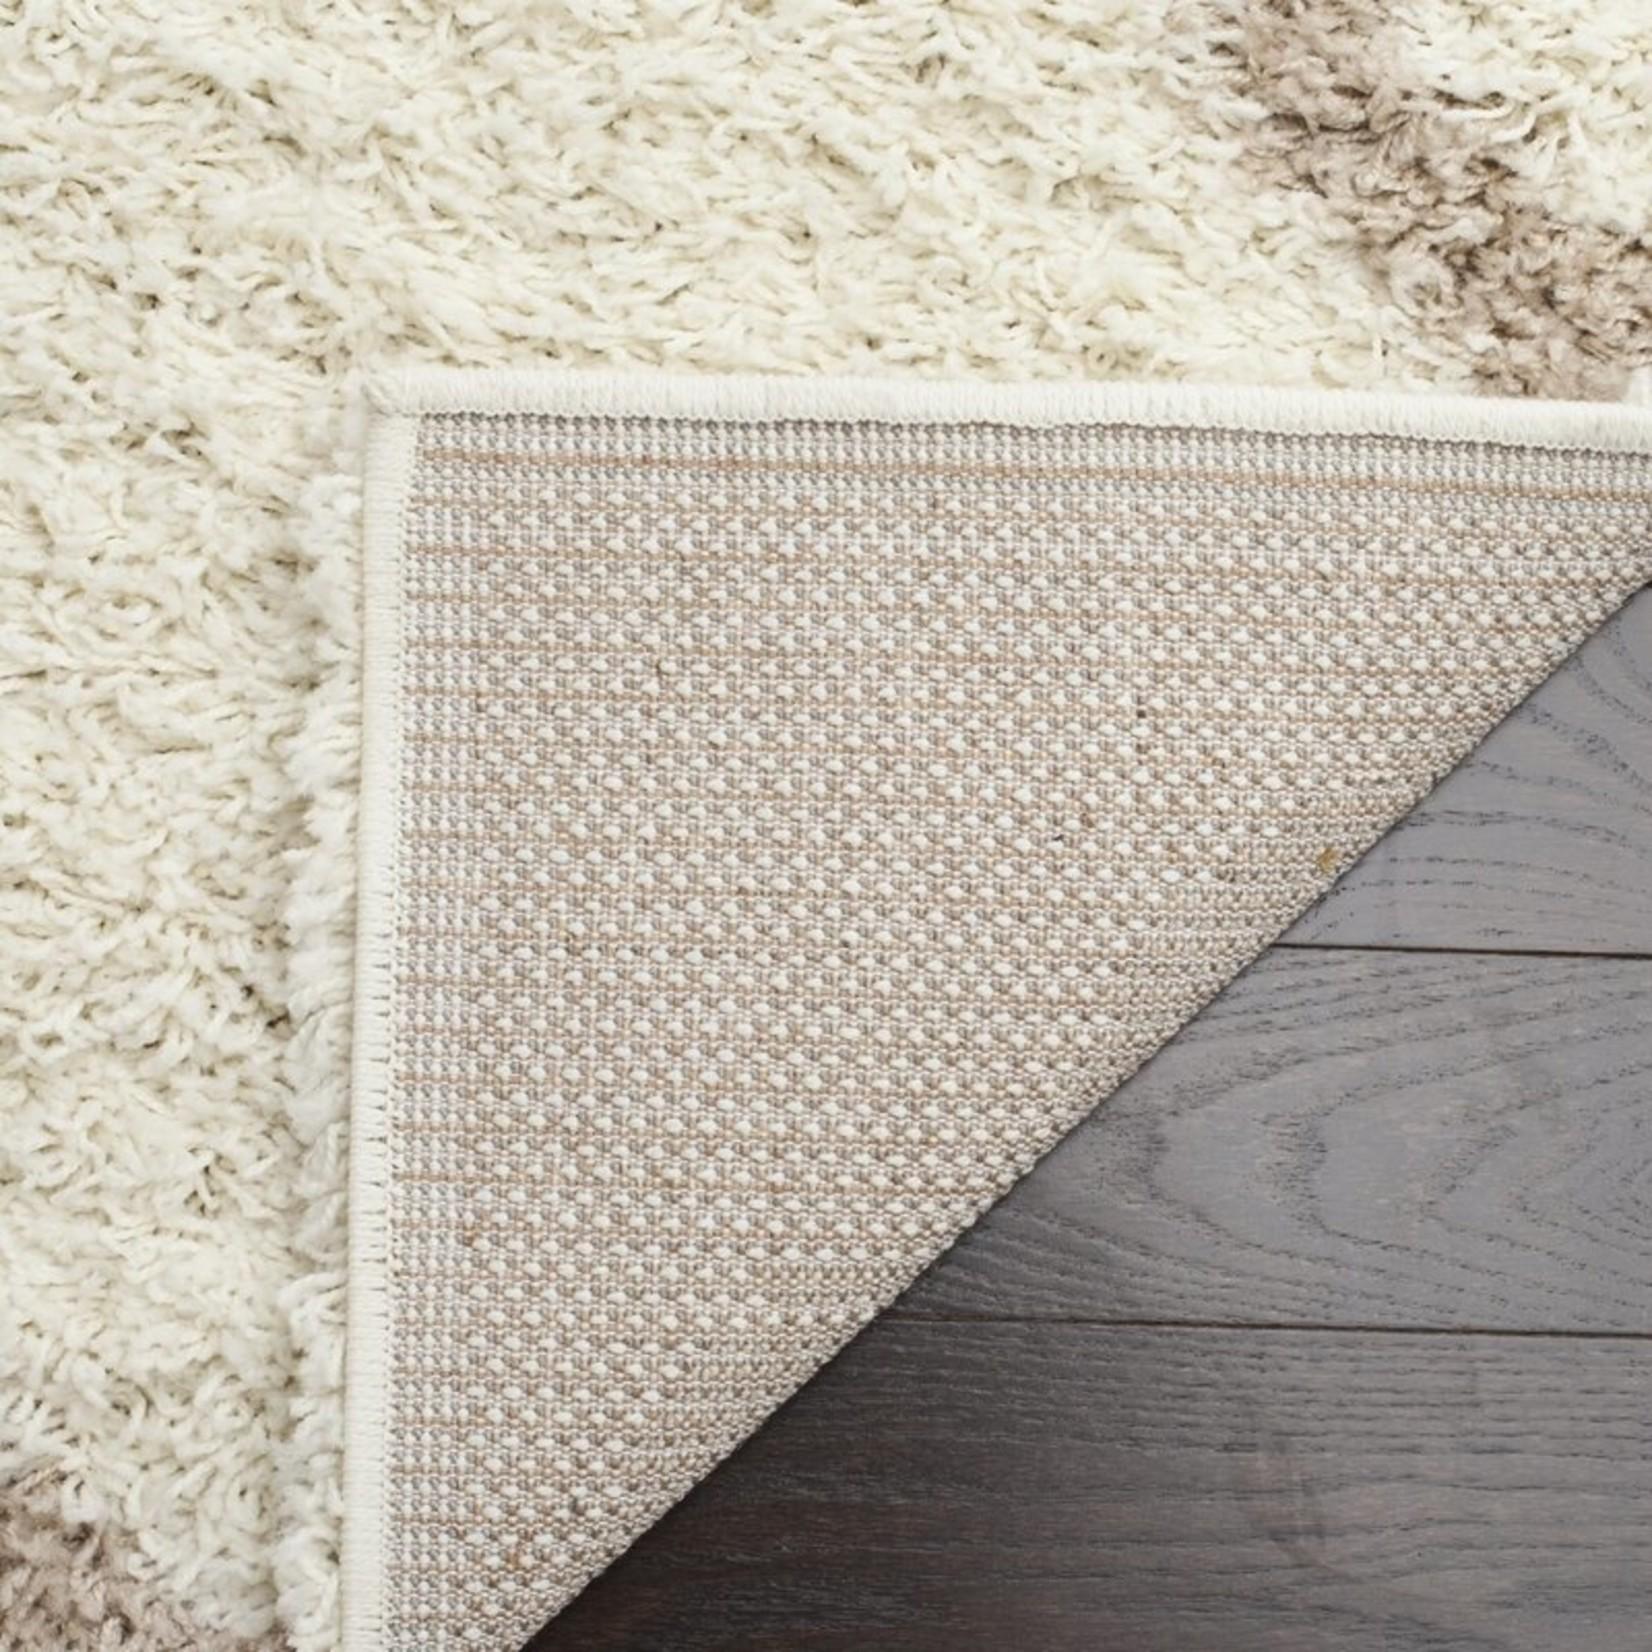 *4' x 6' -Lapidge Geometric Ivory/Beige Area Rug